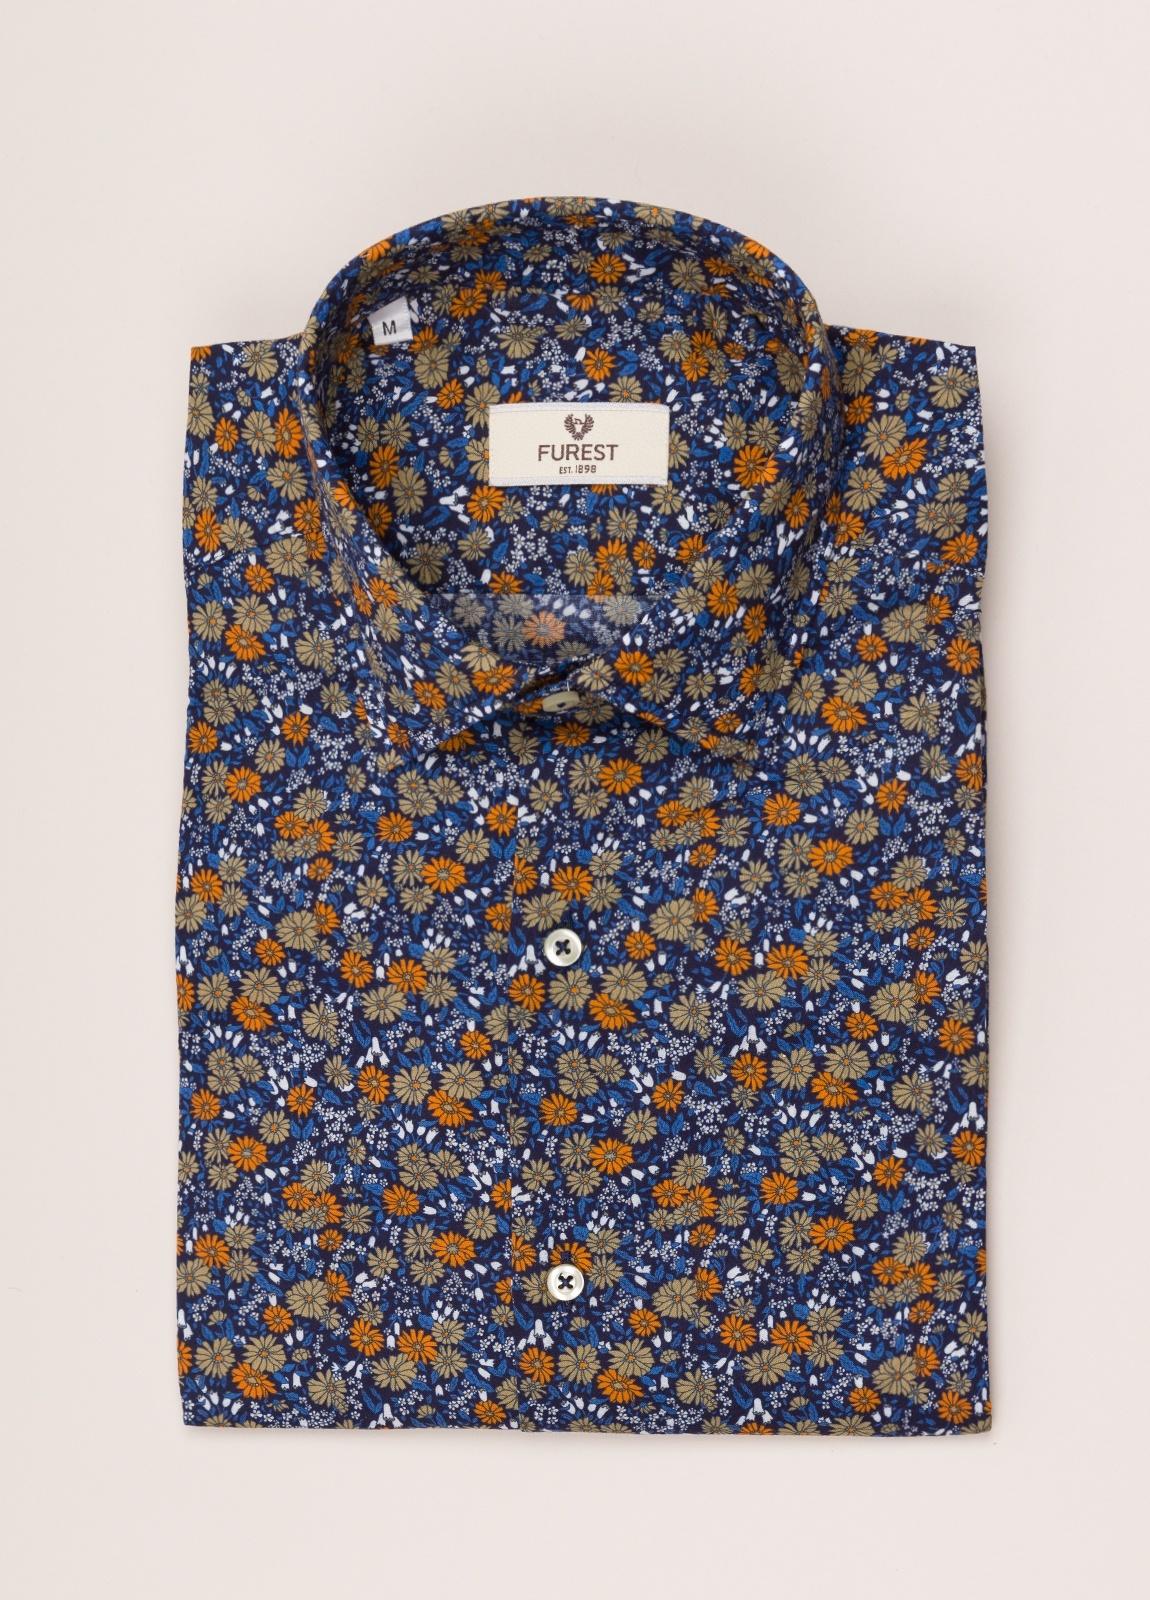 Camisa sport FUREST COLECCIÓN SLIM FIT flores azul - Ítem4